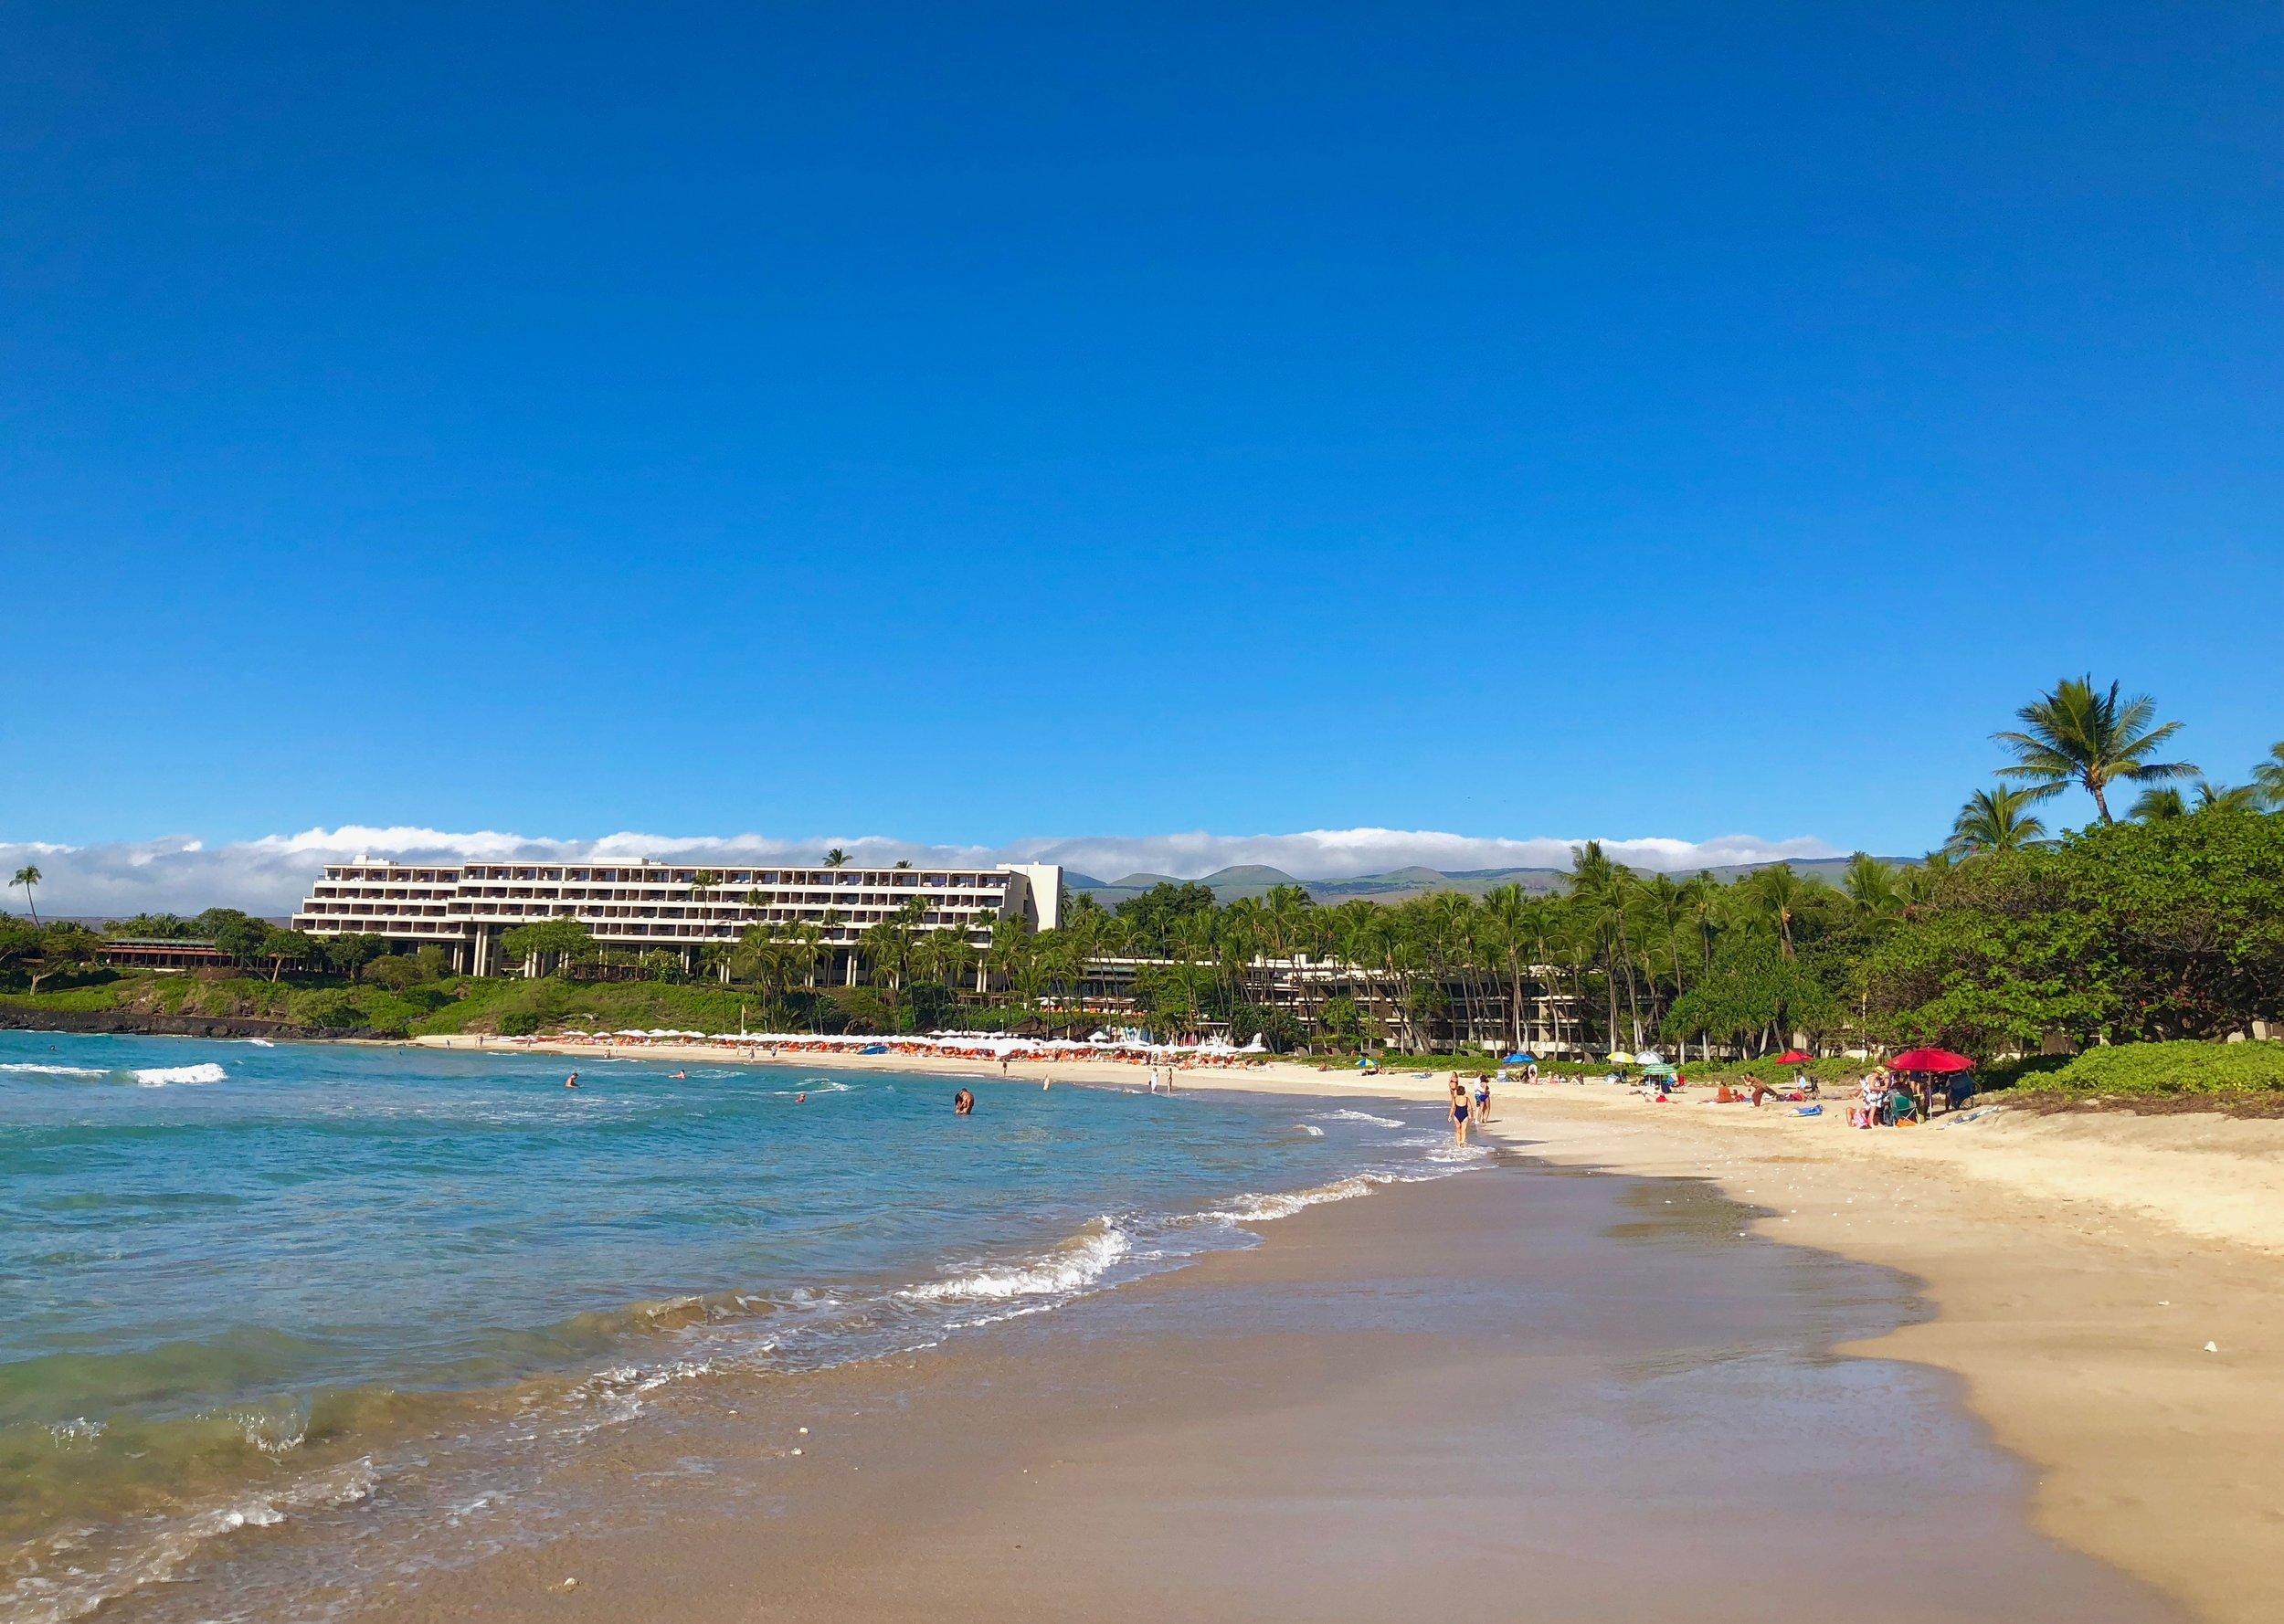 The Beach at the Mauna Kea